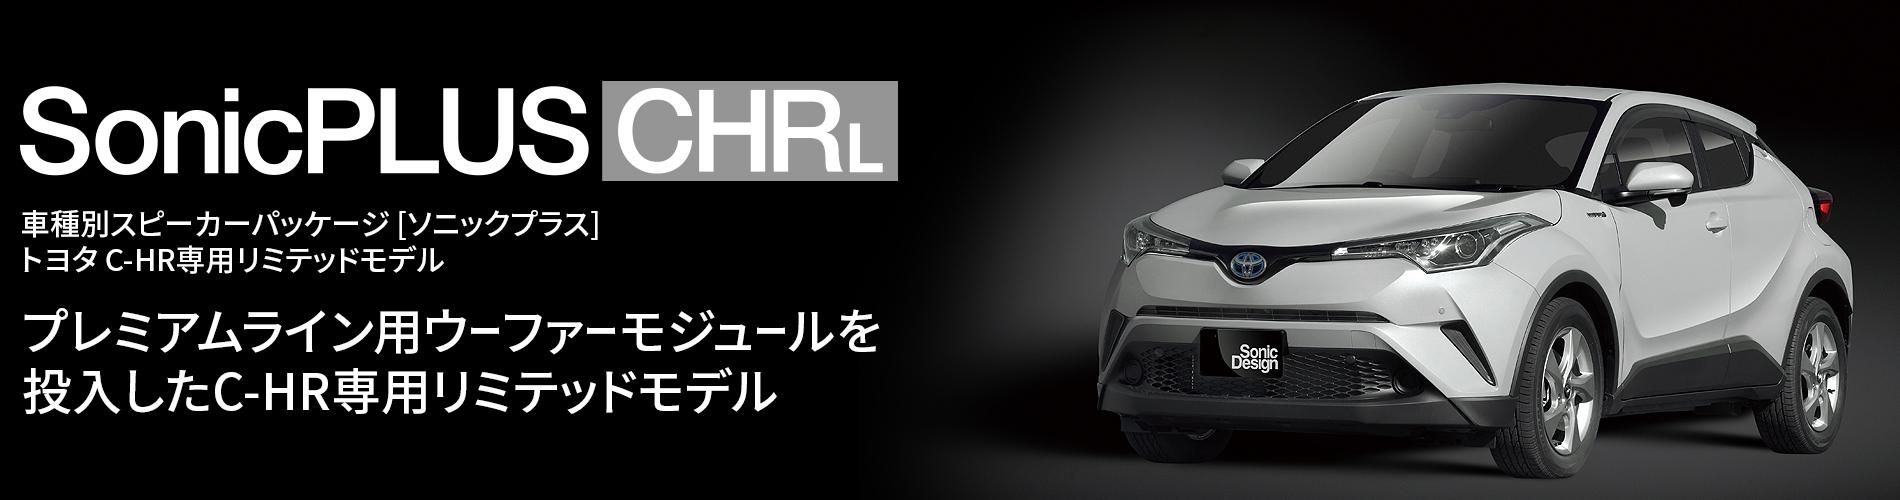 C-HR リミテッド